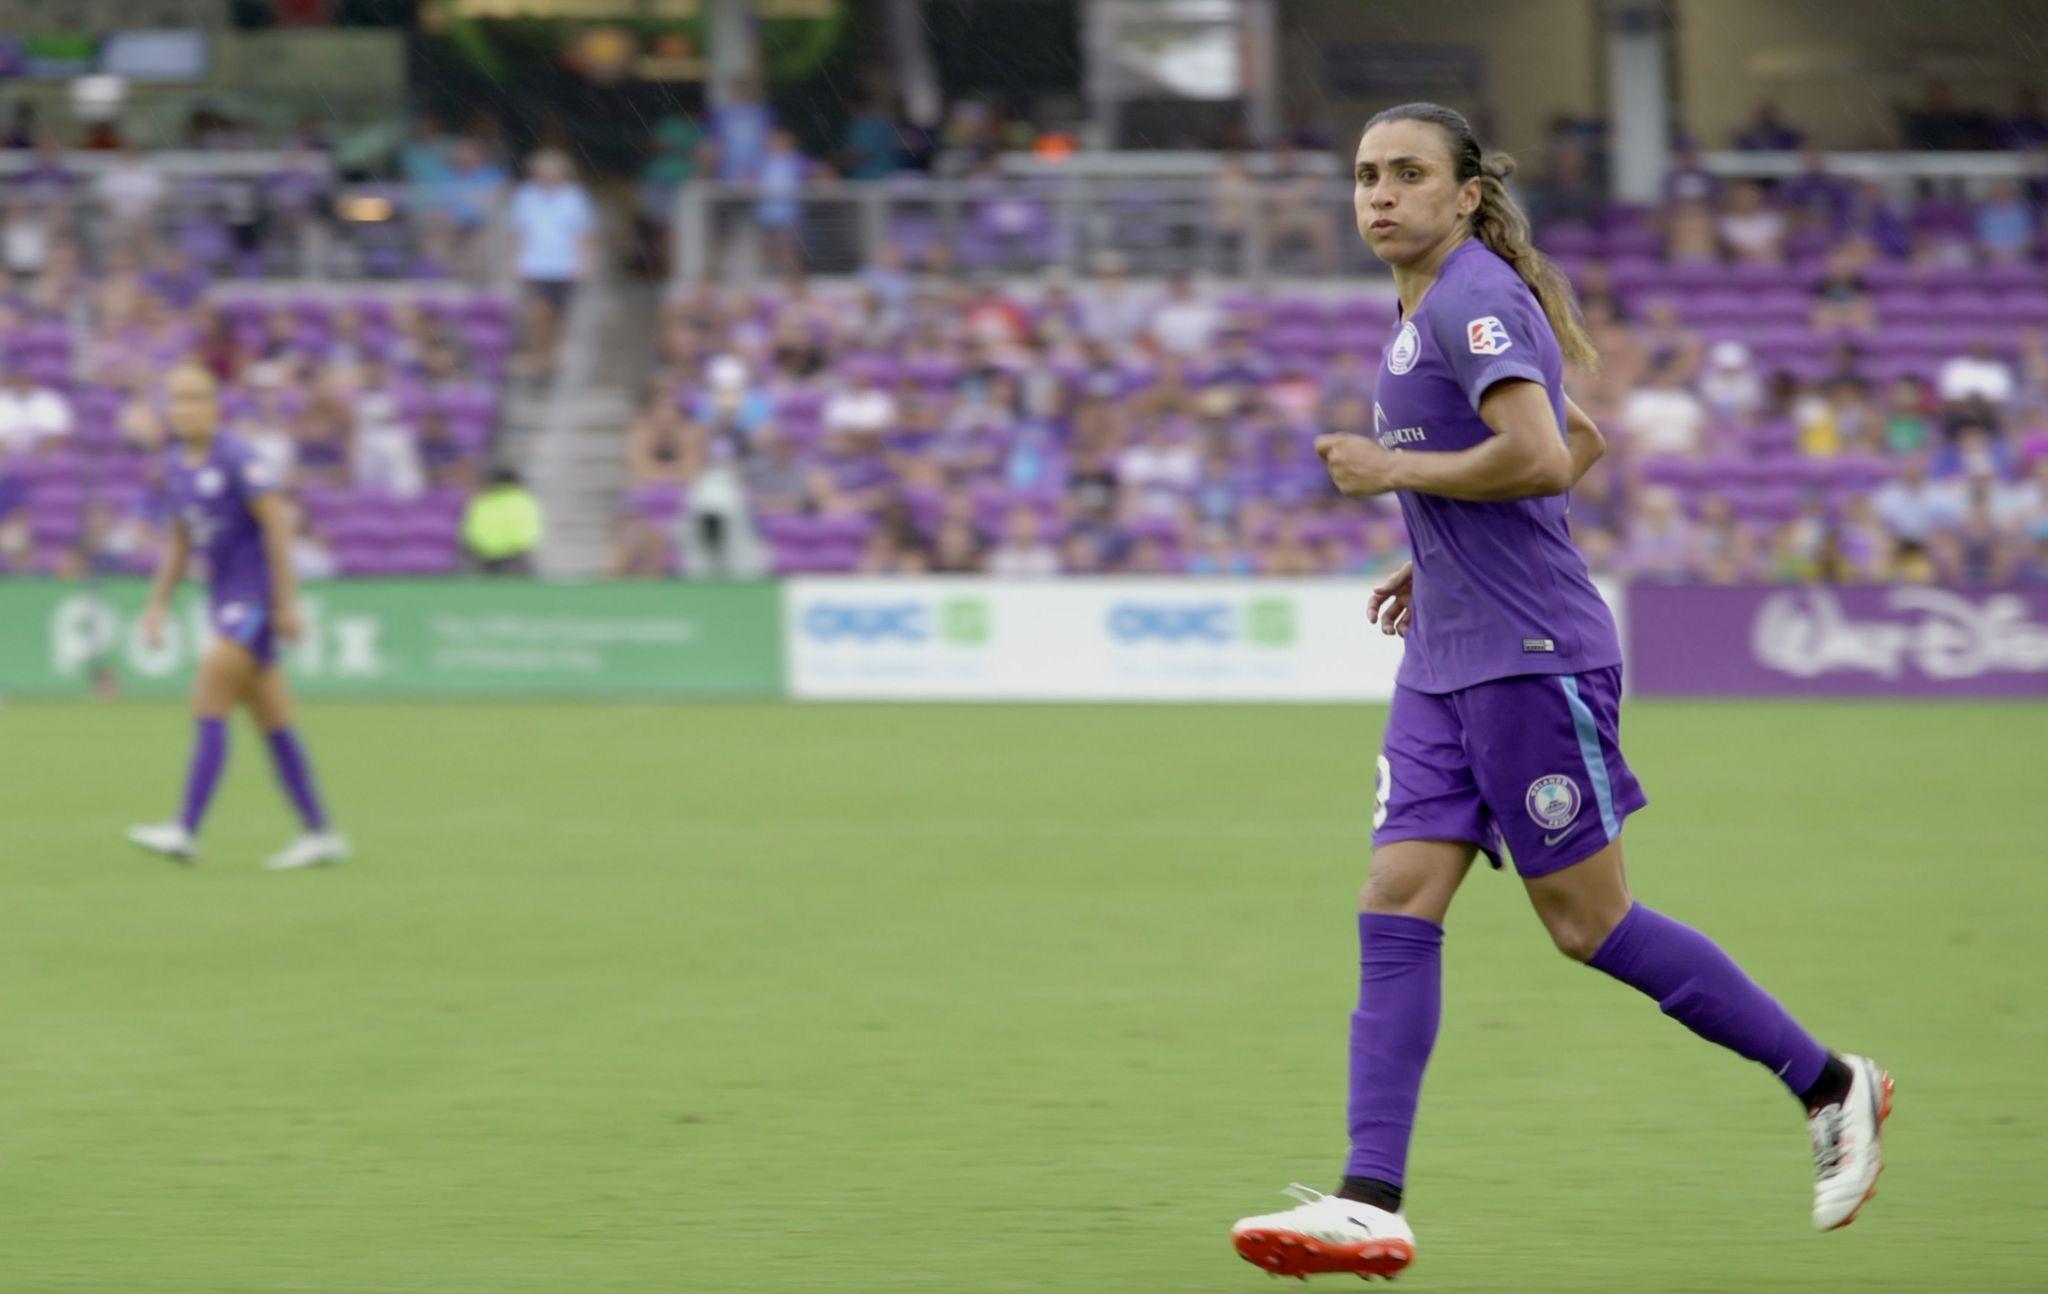 Marta playing for Orlando Pride